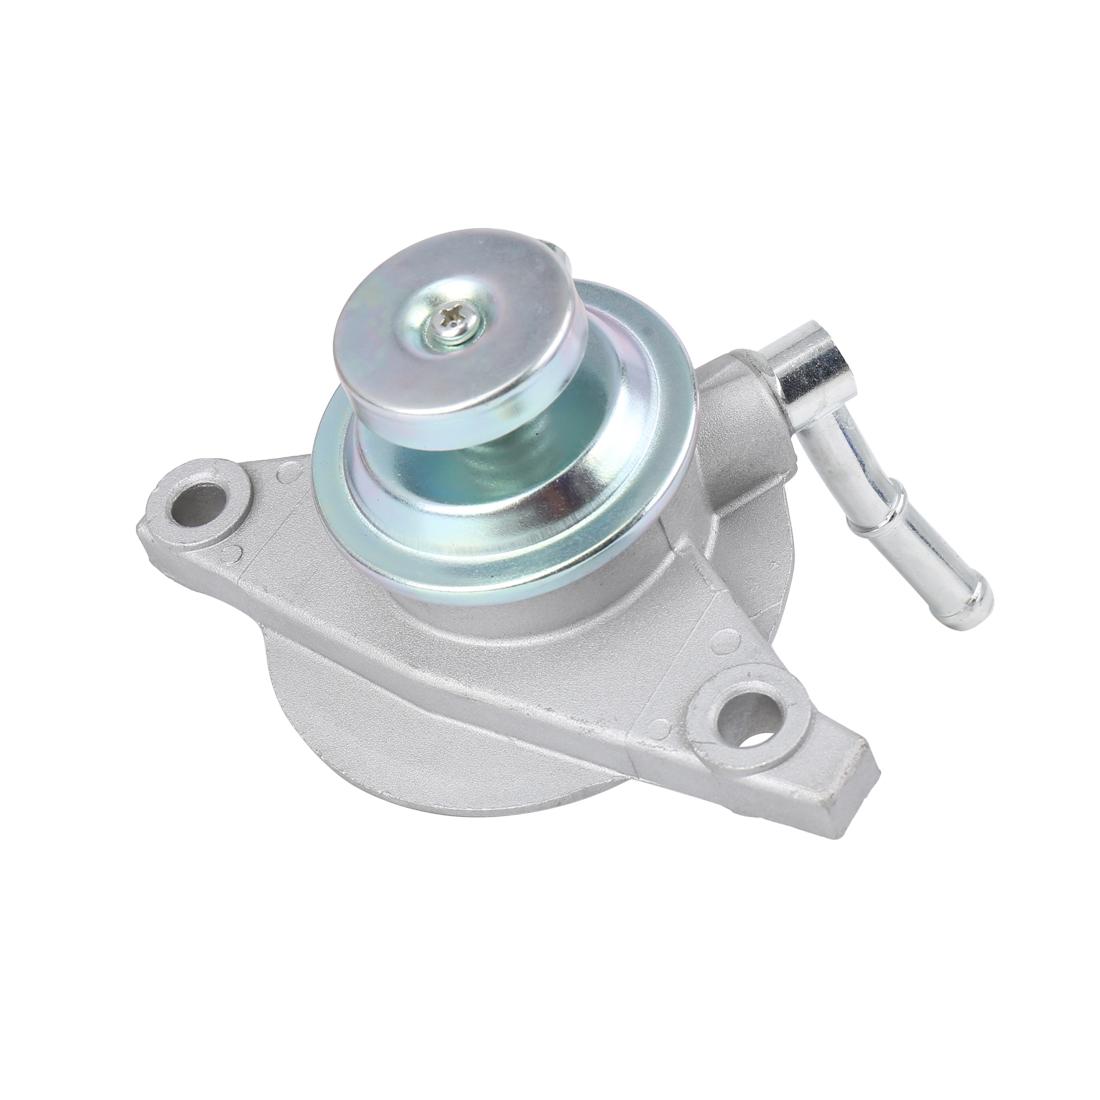 Drill Pump Oil Fuel Fluids Kerosene Water Liquid Separator for 2330-64320